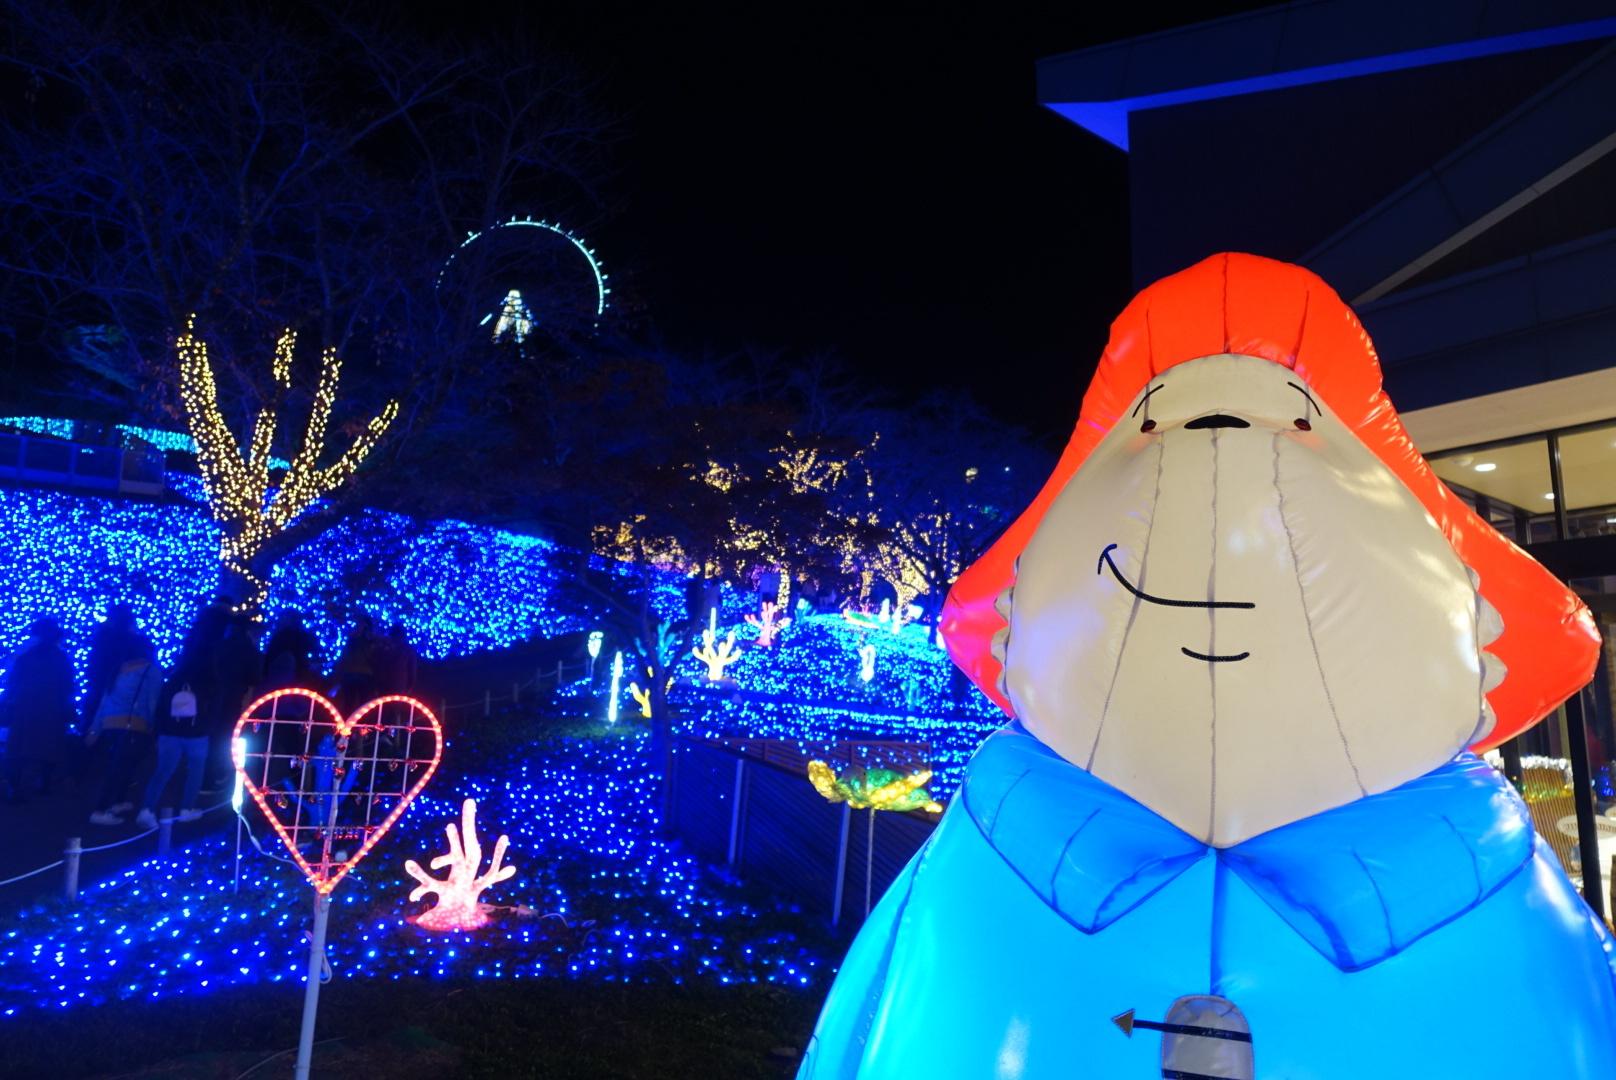 Vol.64♡ 関東最大級!600万級の光の祭典【さがみ湖イルミリオン】_1_8